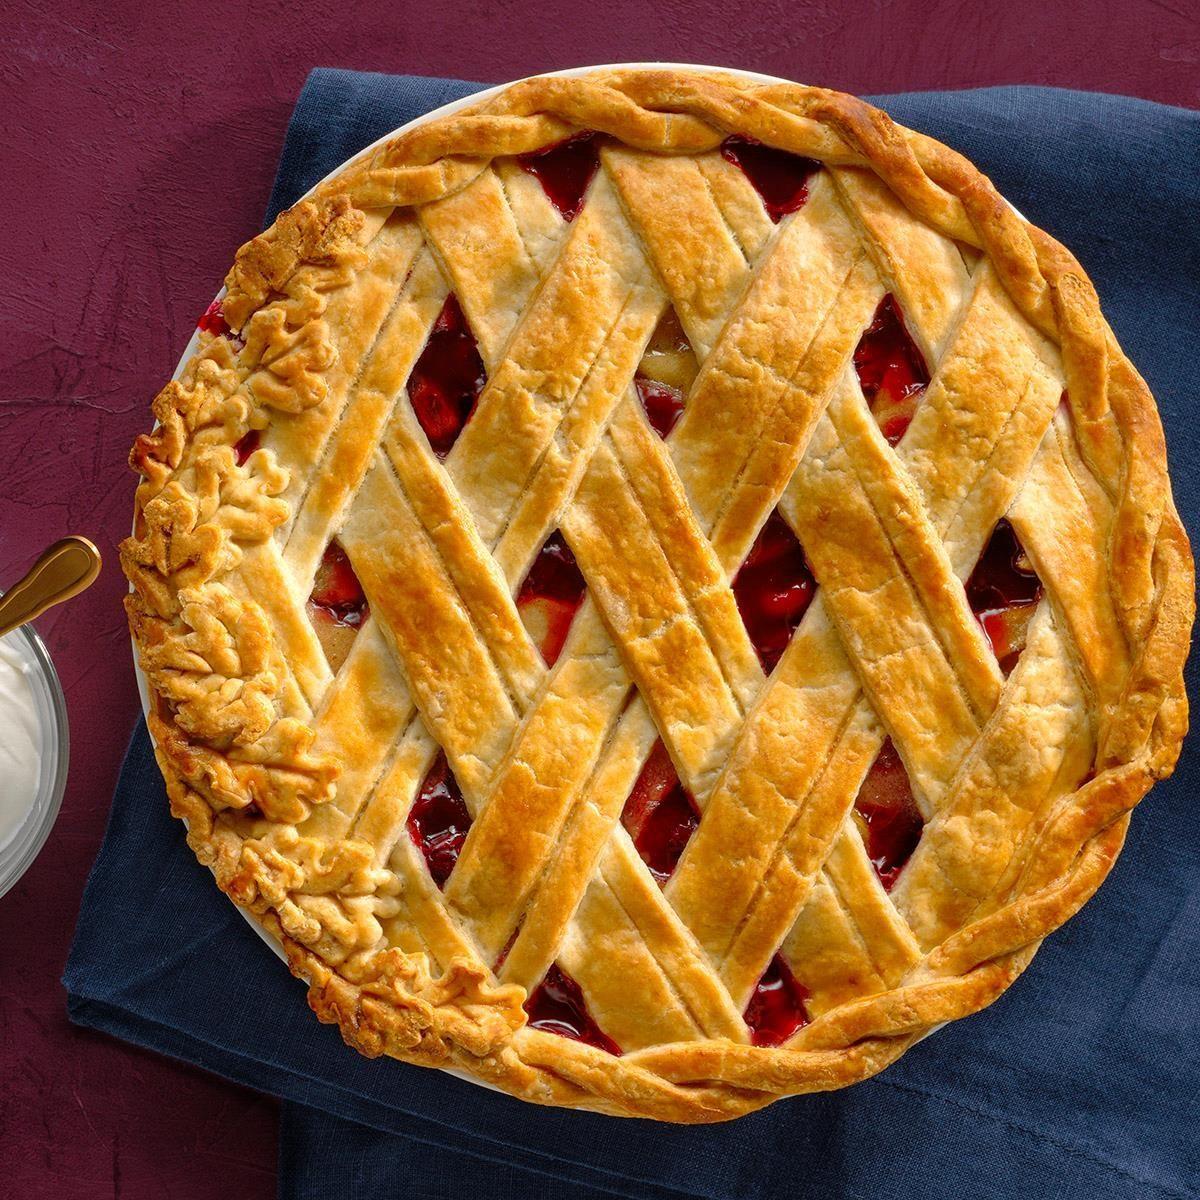 Cran-Apple Pie